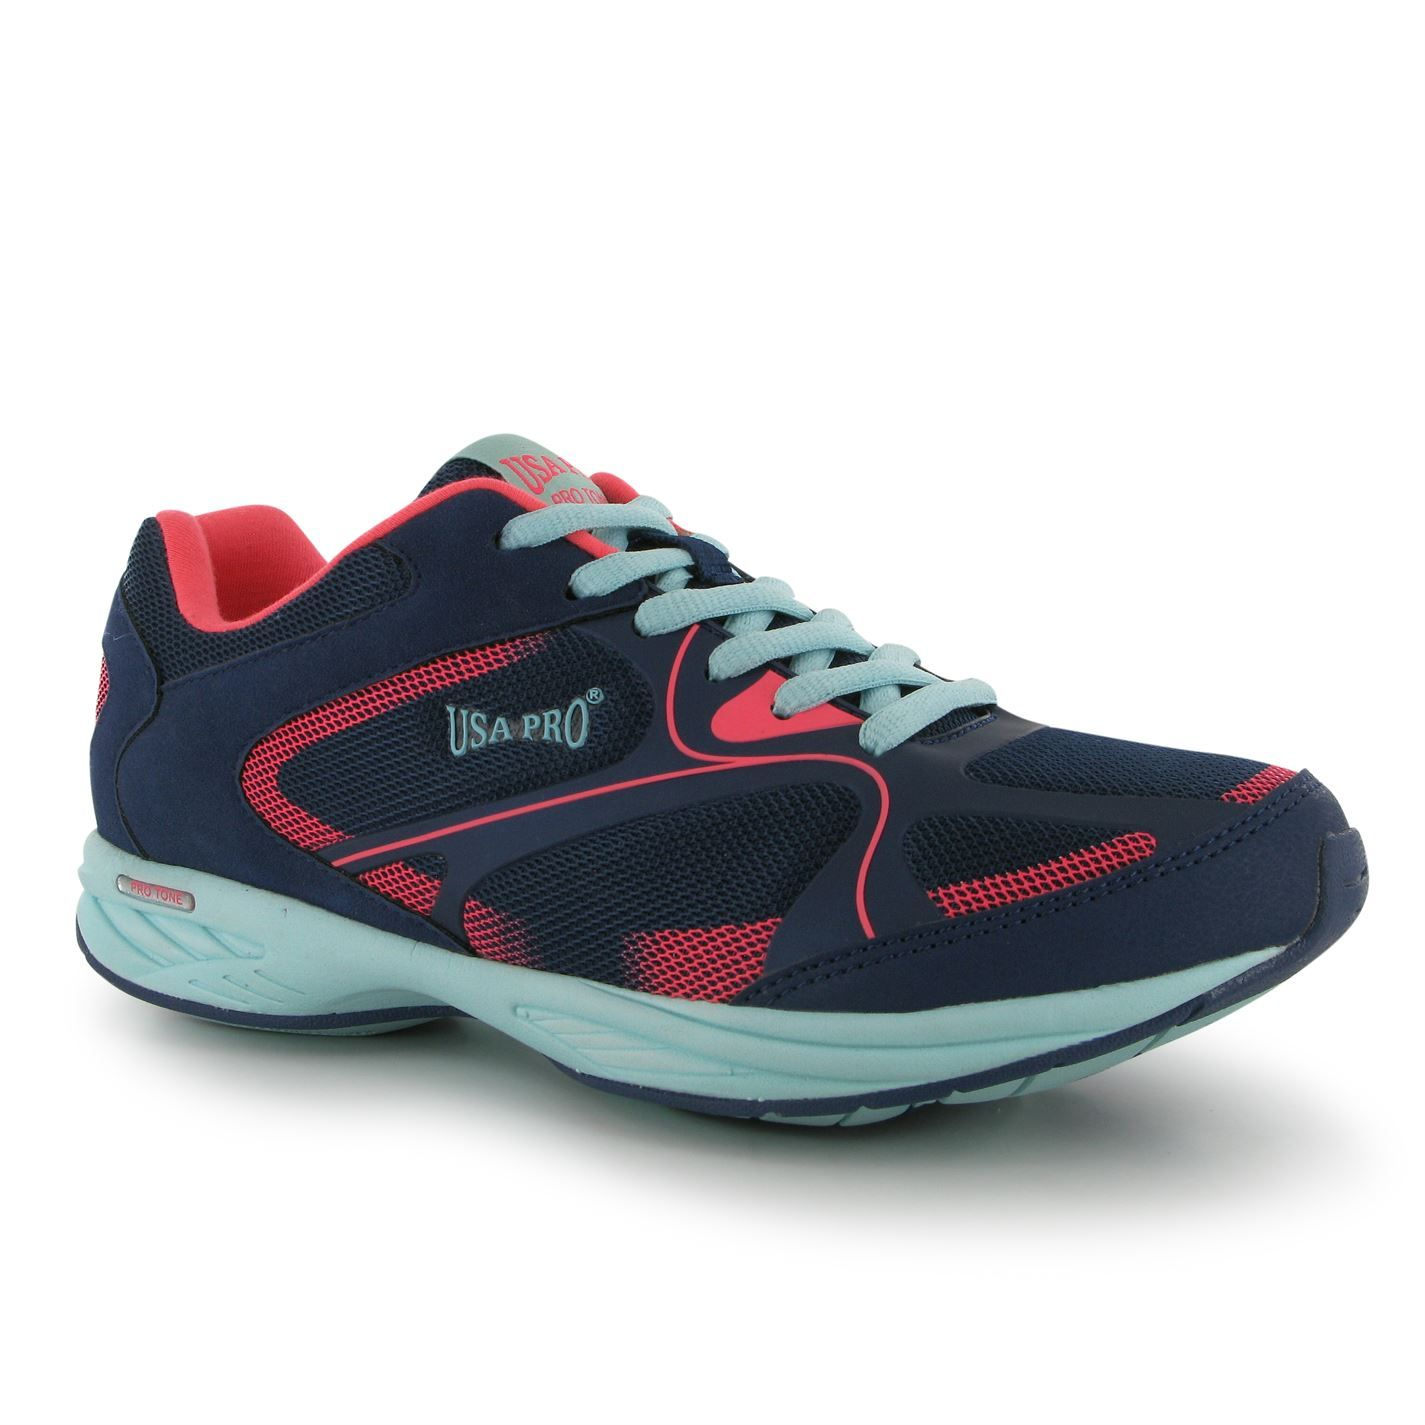 USA Pro Tone Wave Ladies Trainers >> Now £21 health